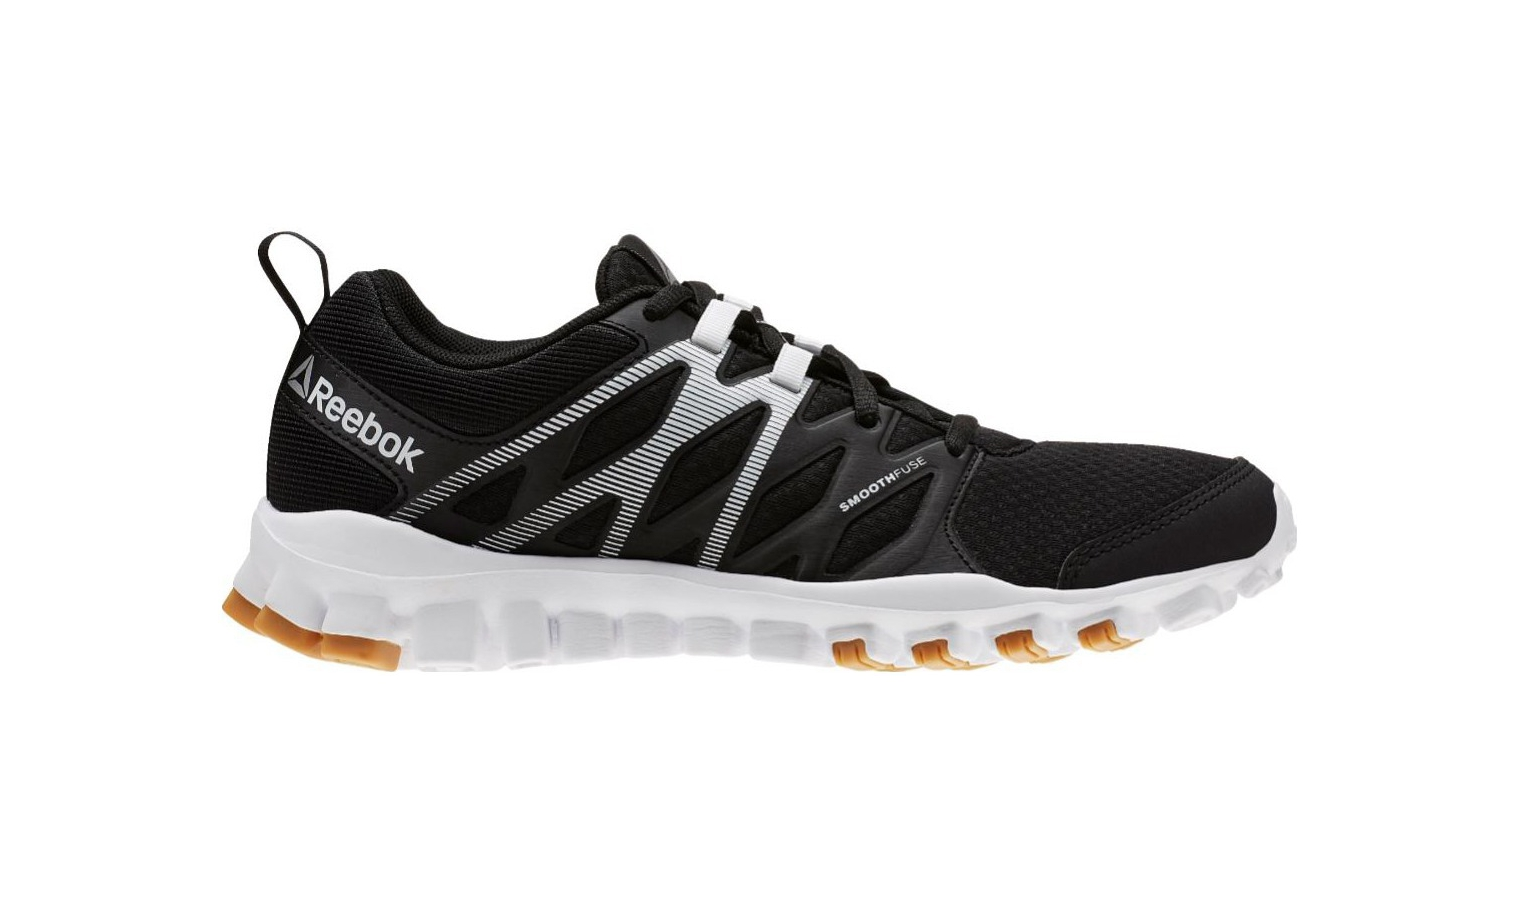 ... Dámské tréninkové boty Reebok REALFLEX TRAIN 4.0 černé. Sleva aba0ea8e99